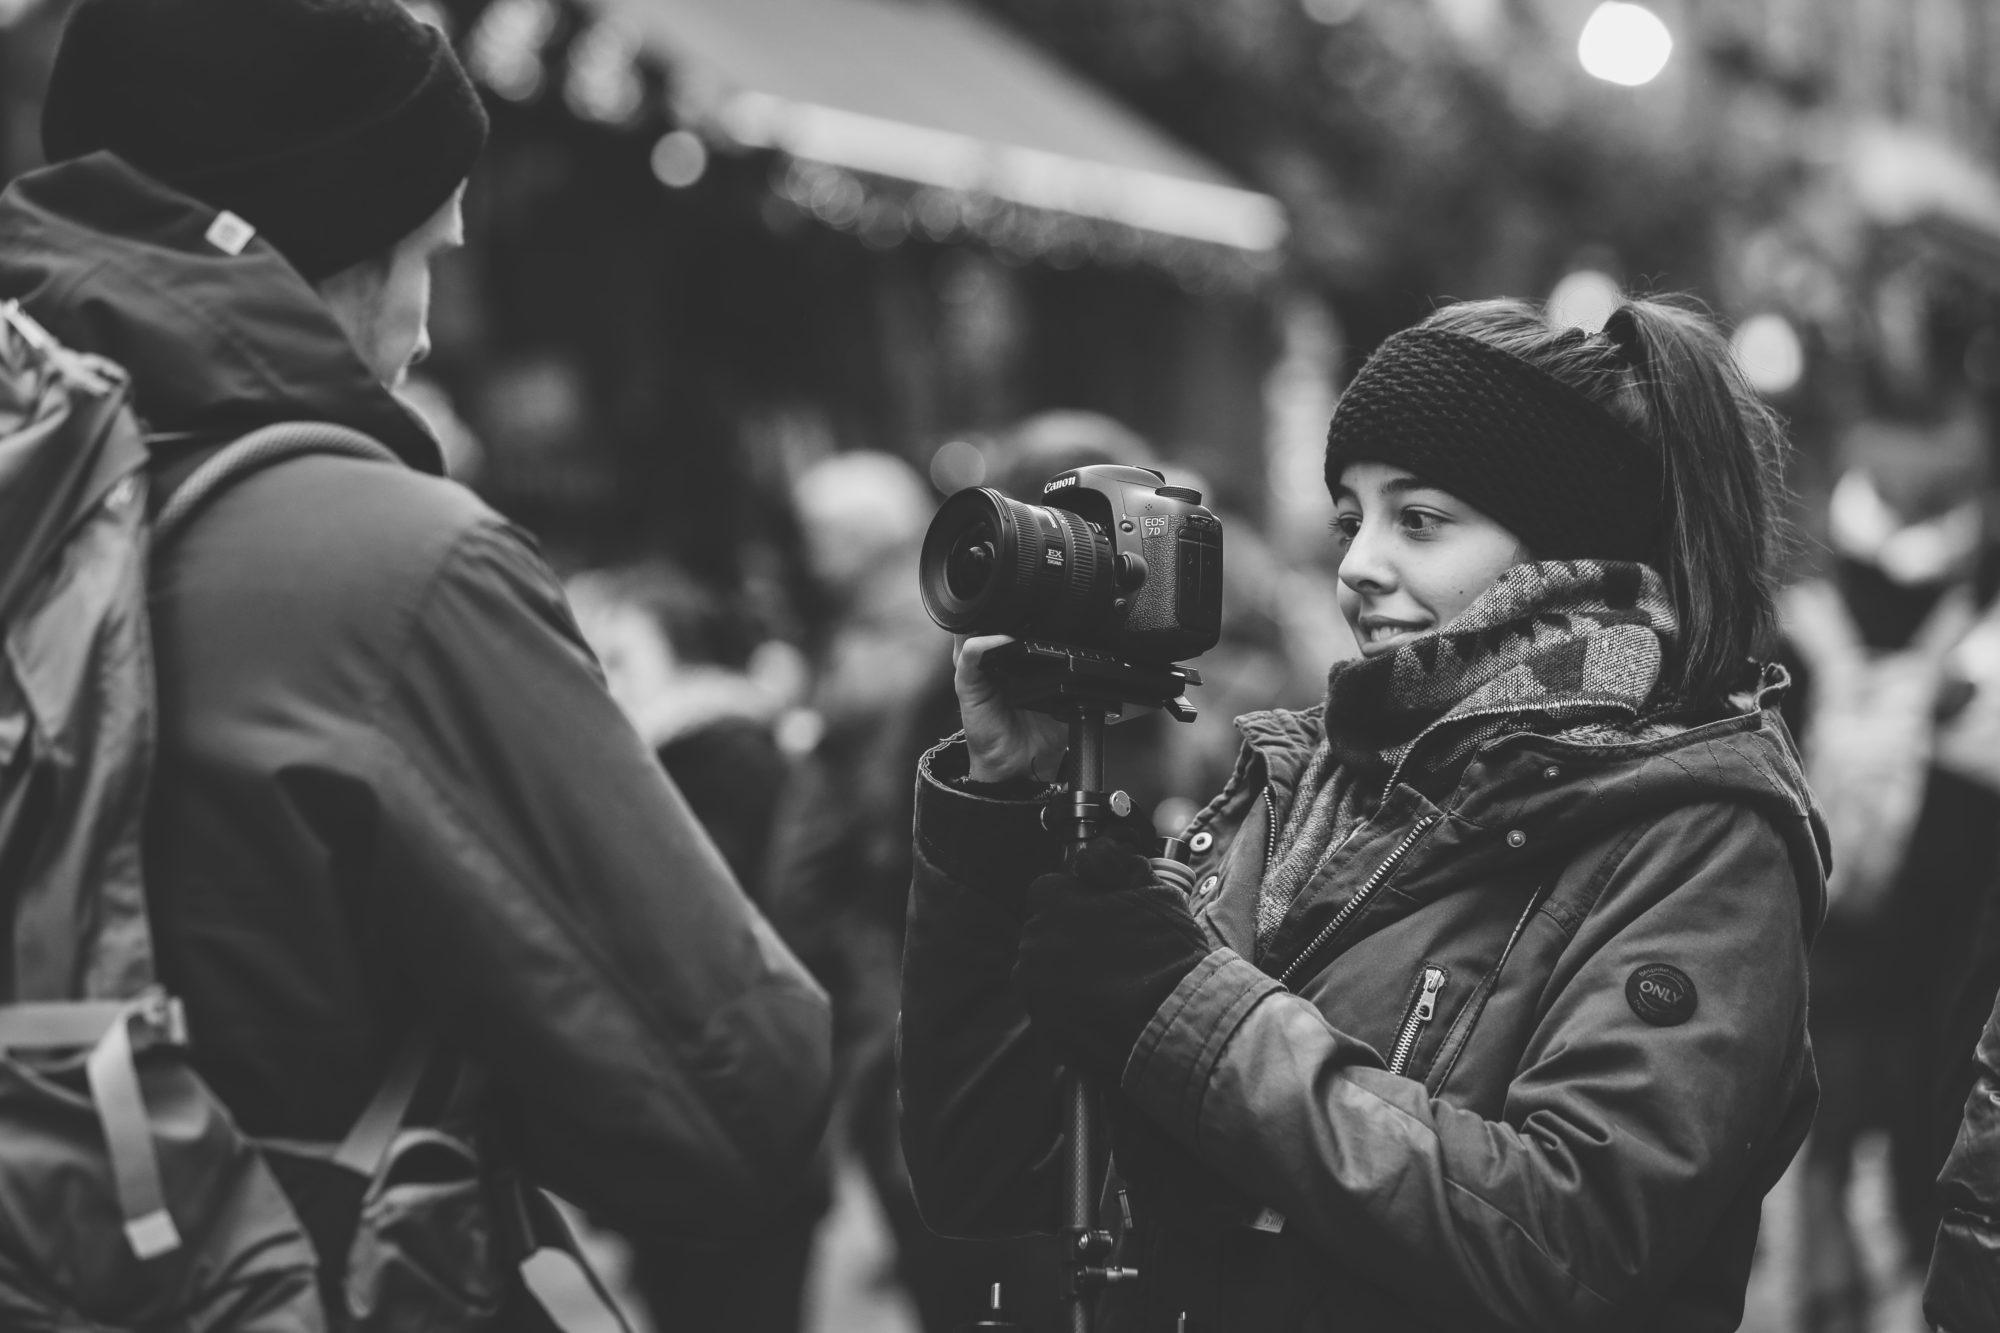 kasuma-streetphotography-travel-blog-strasbourg-christmas-2015-10